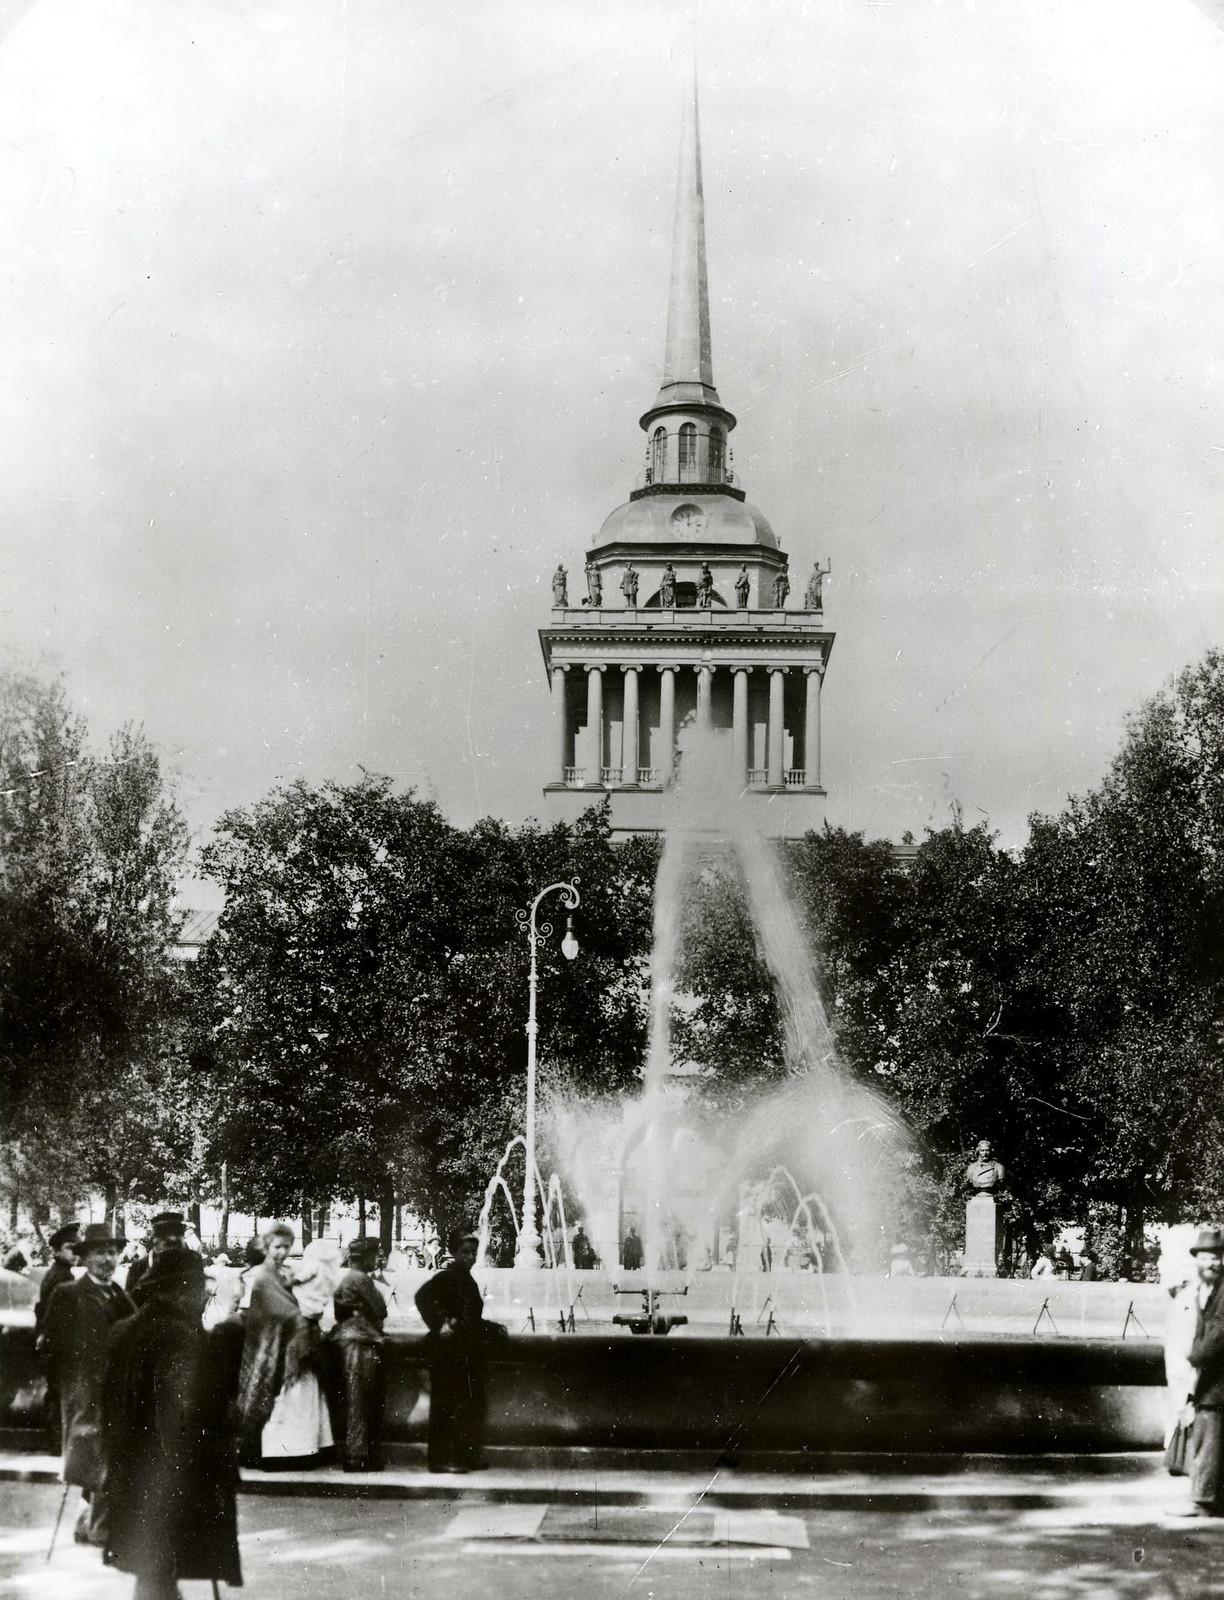 1904. Александровский сад, фонтан, Адмиралтейство (вариант)